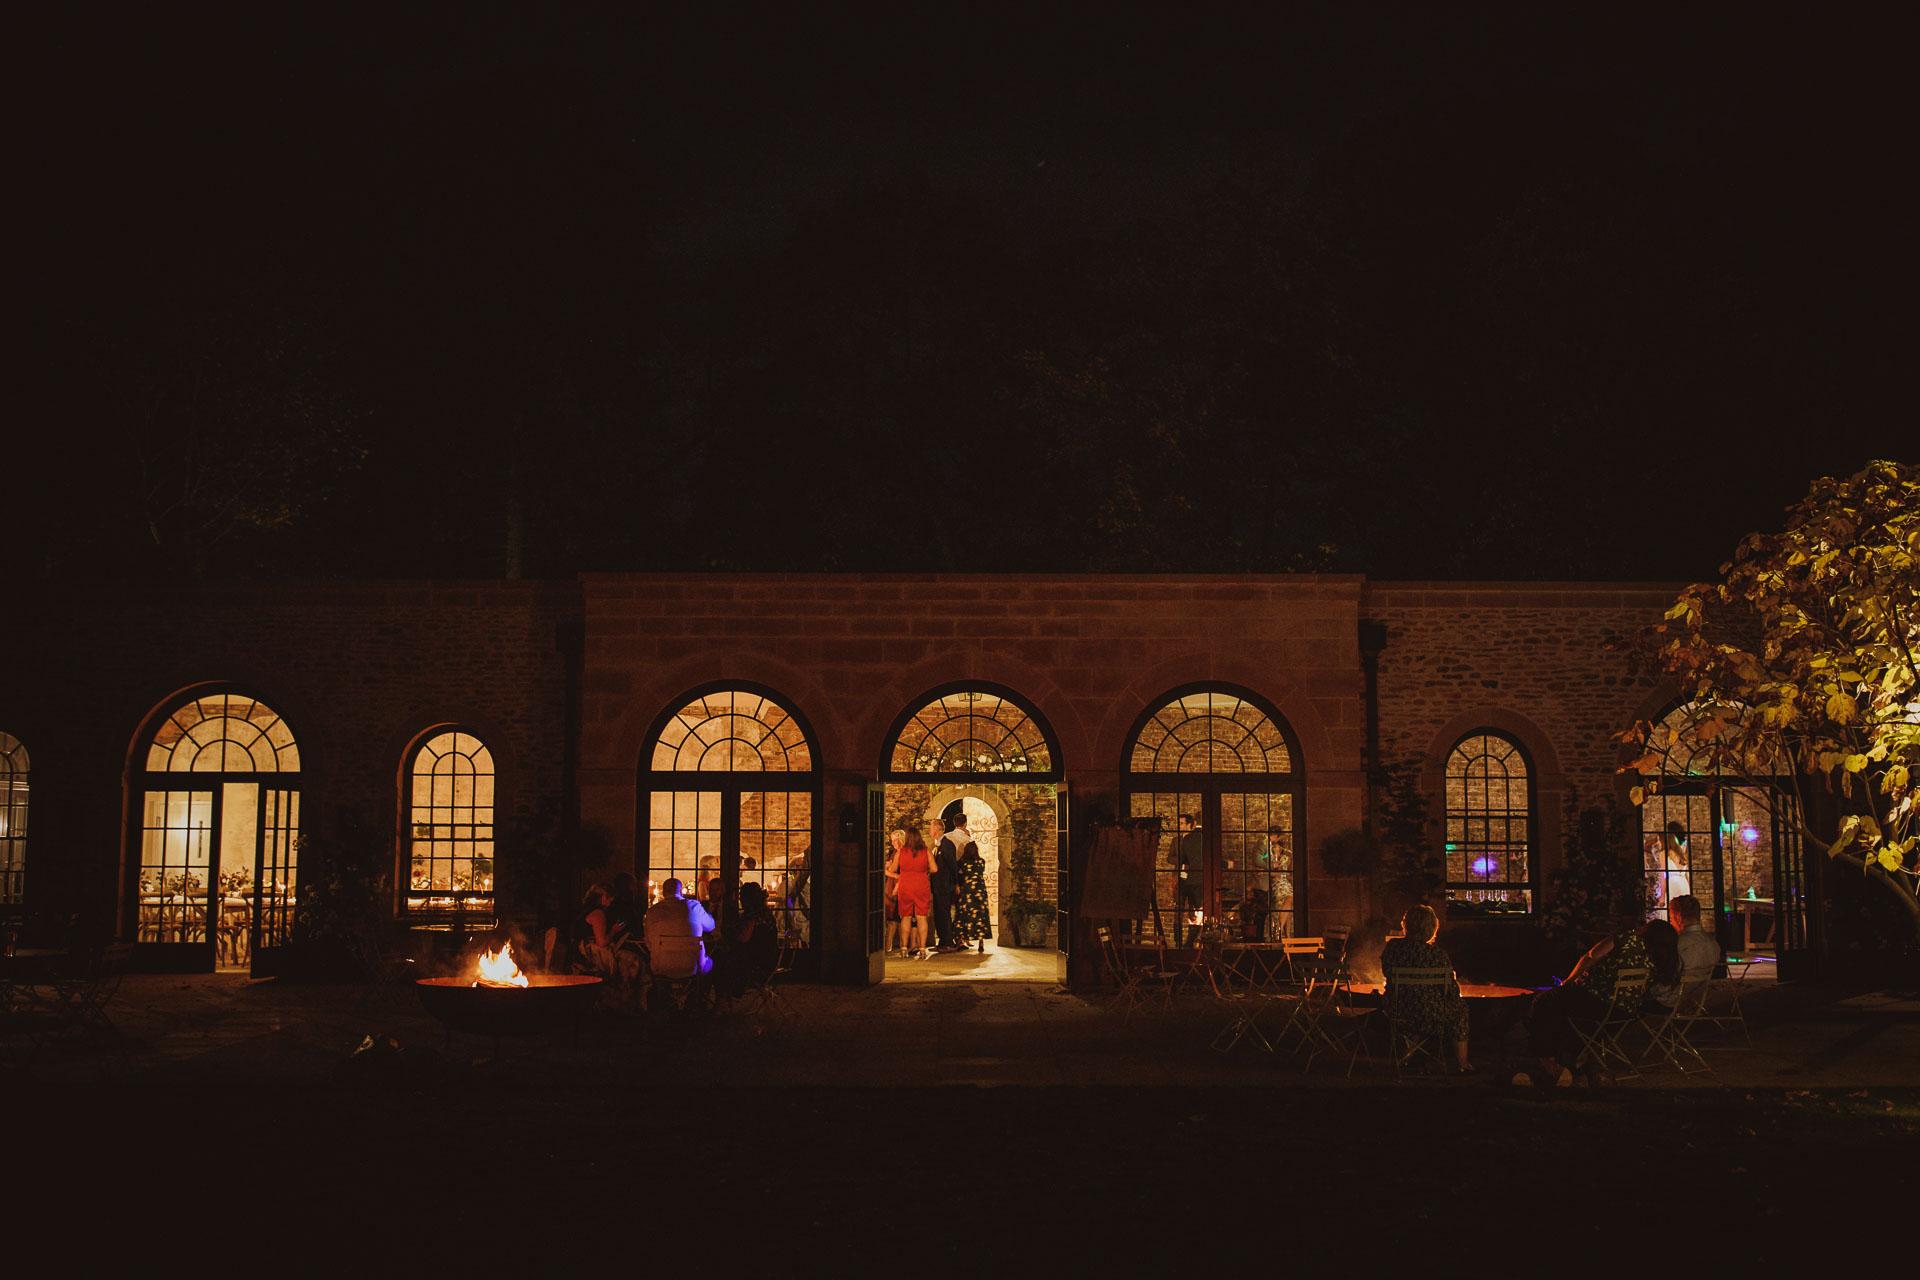 middleton_lodge_wedding_photographer-140.jpg